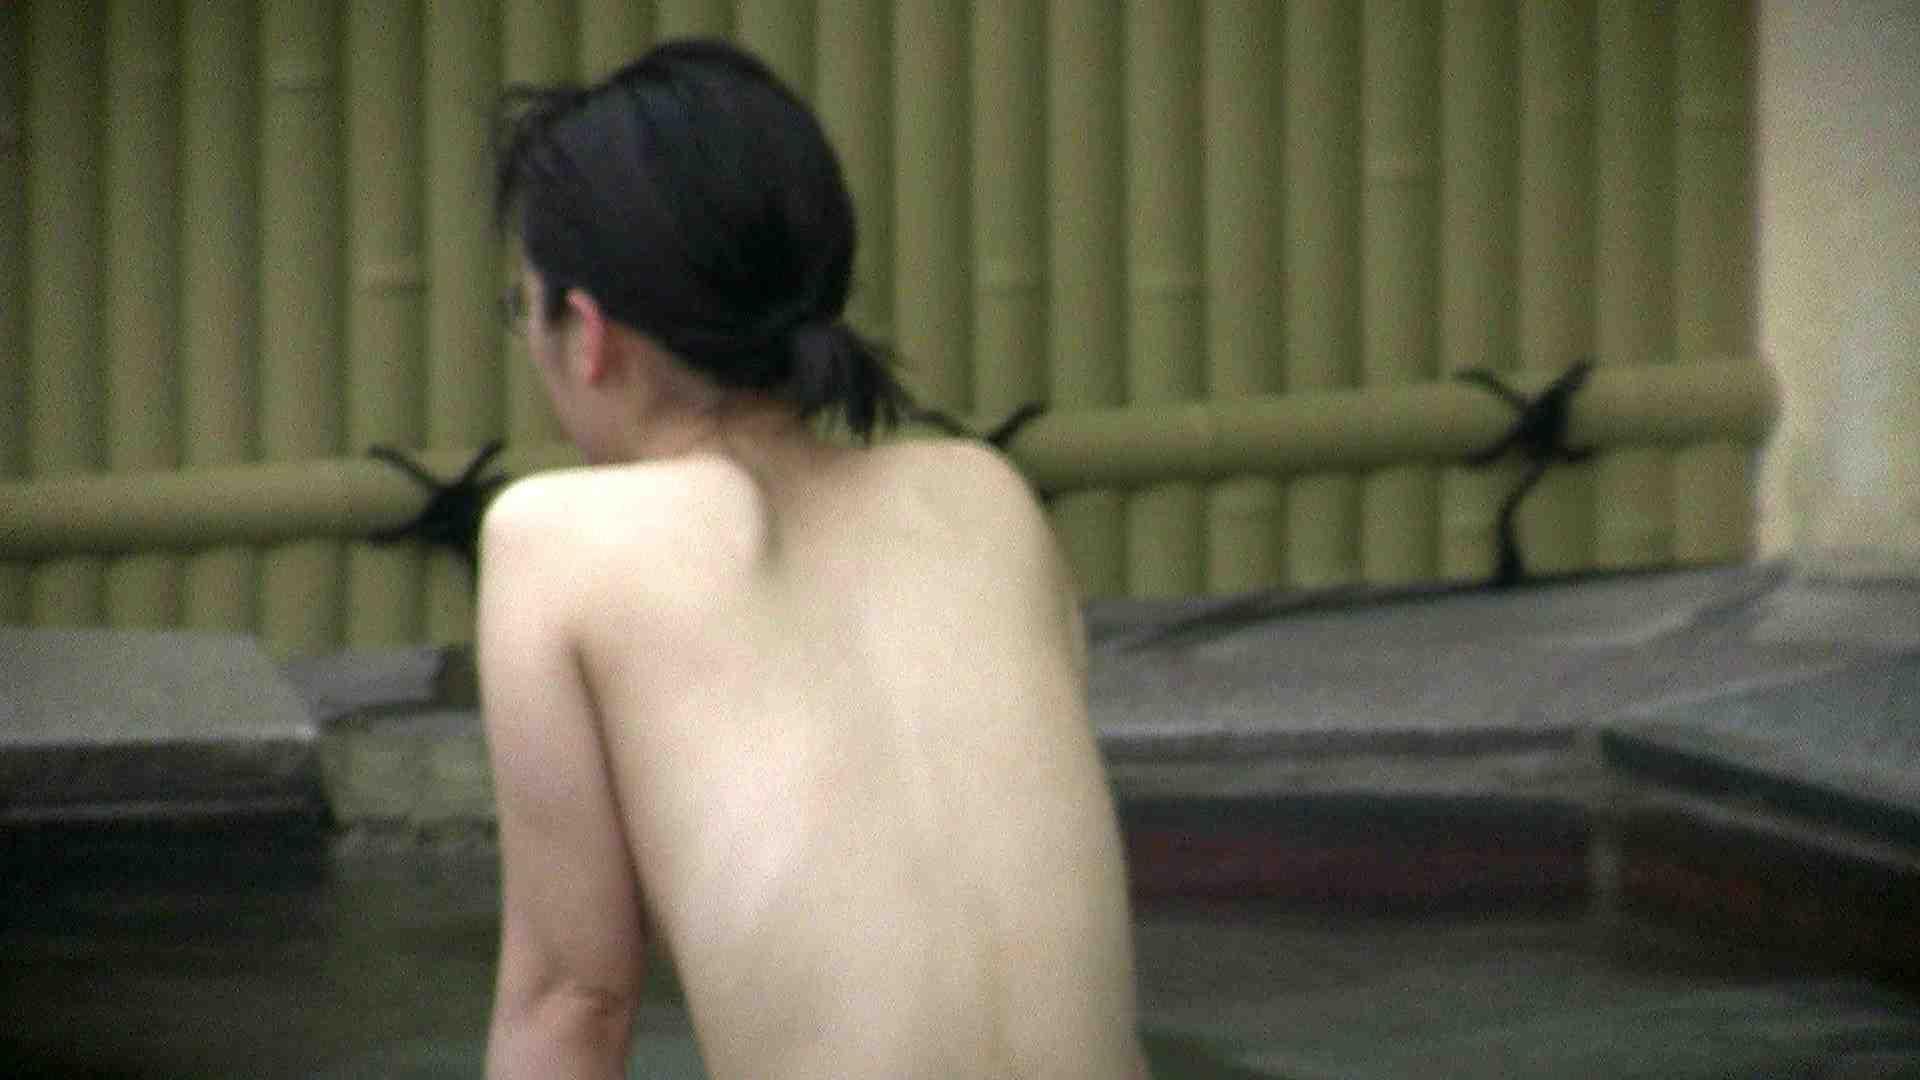 Aquaな露天風呂Vol.684 HなOL オメコ動画キャプチャ 87pic 82